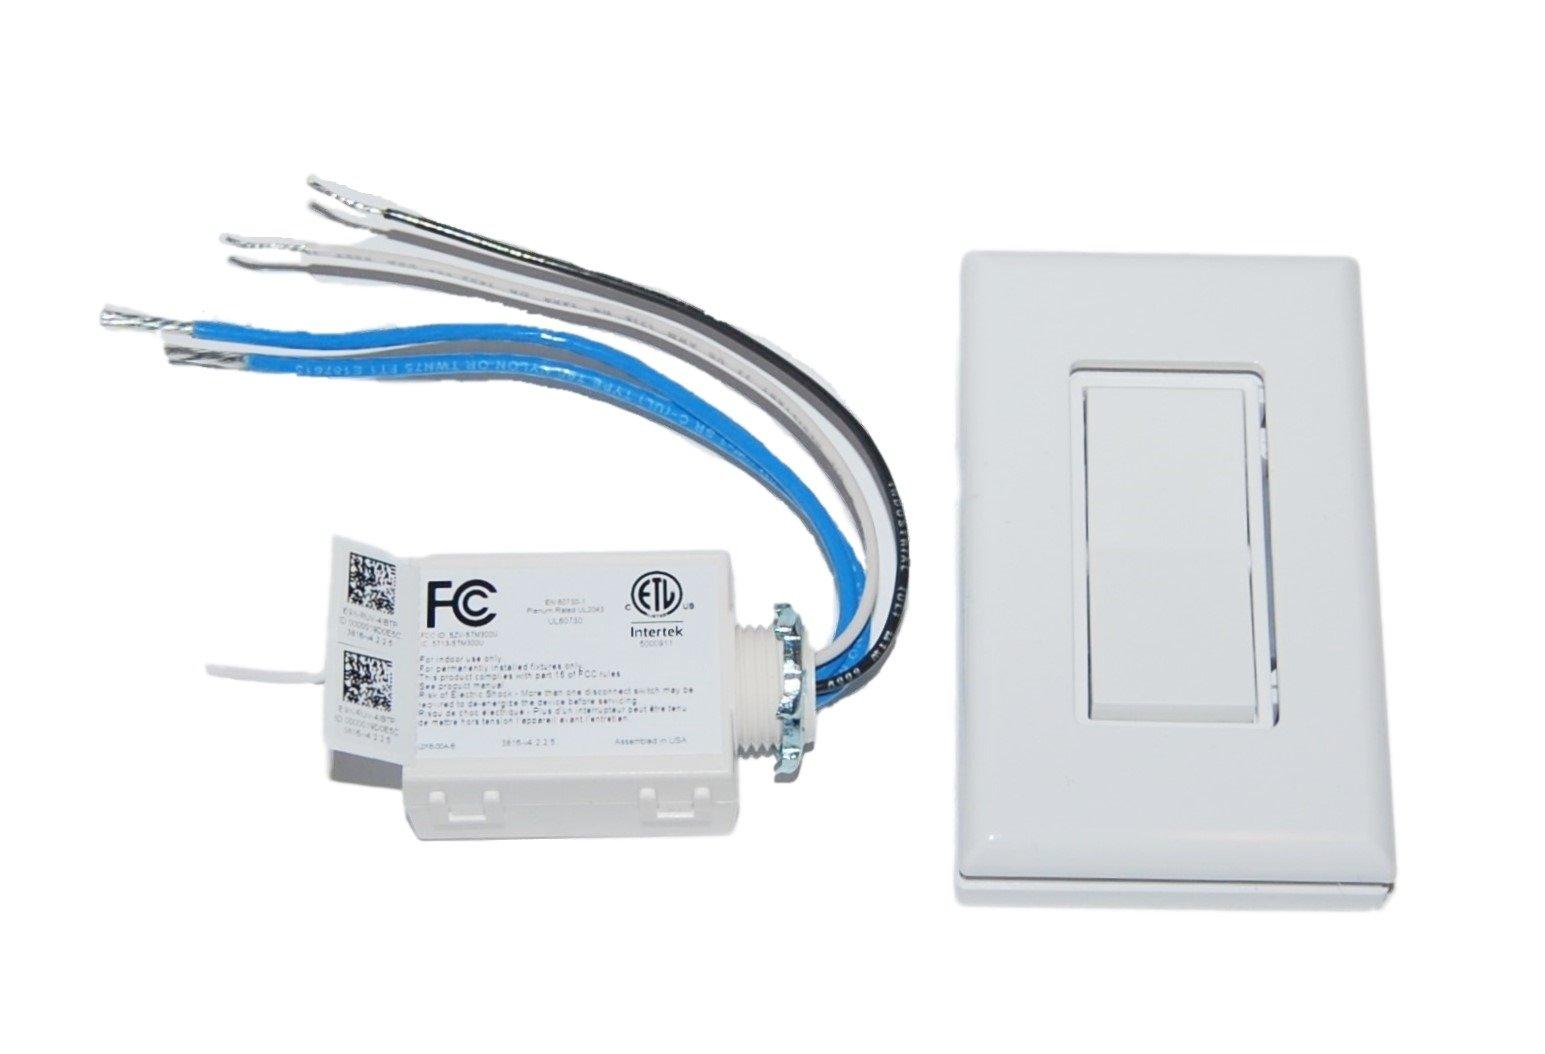 High Power Wireless Light Switch Kit - Voltage Range 100-277V